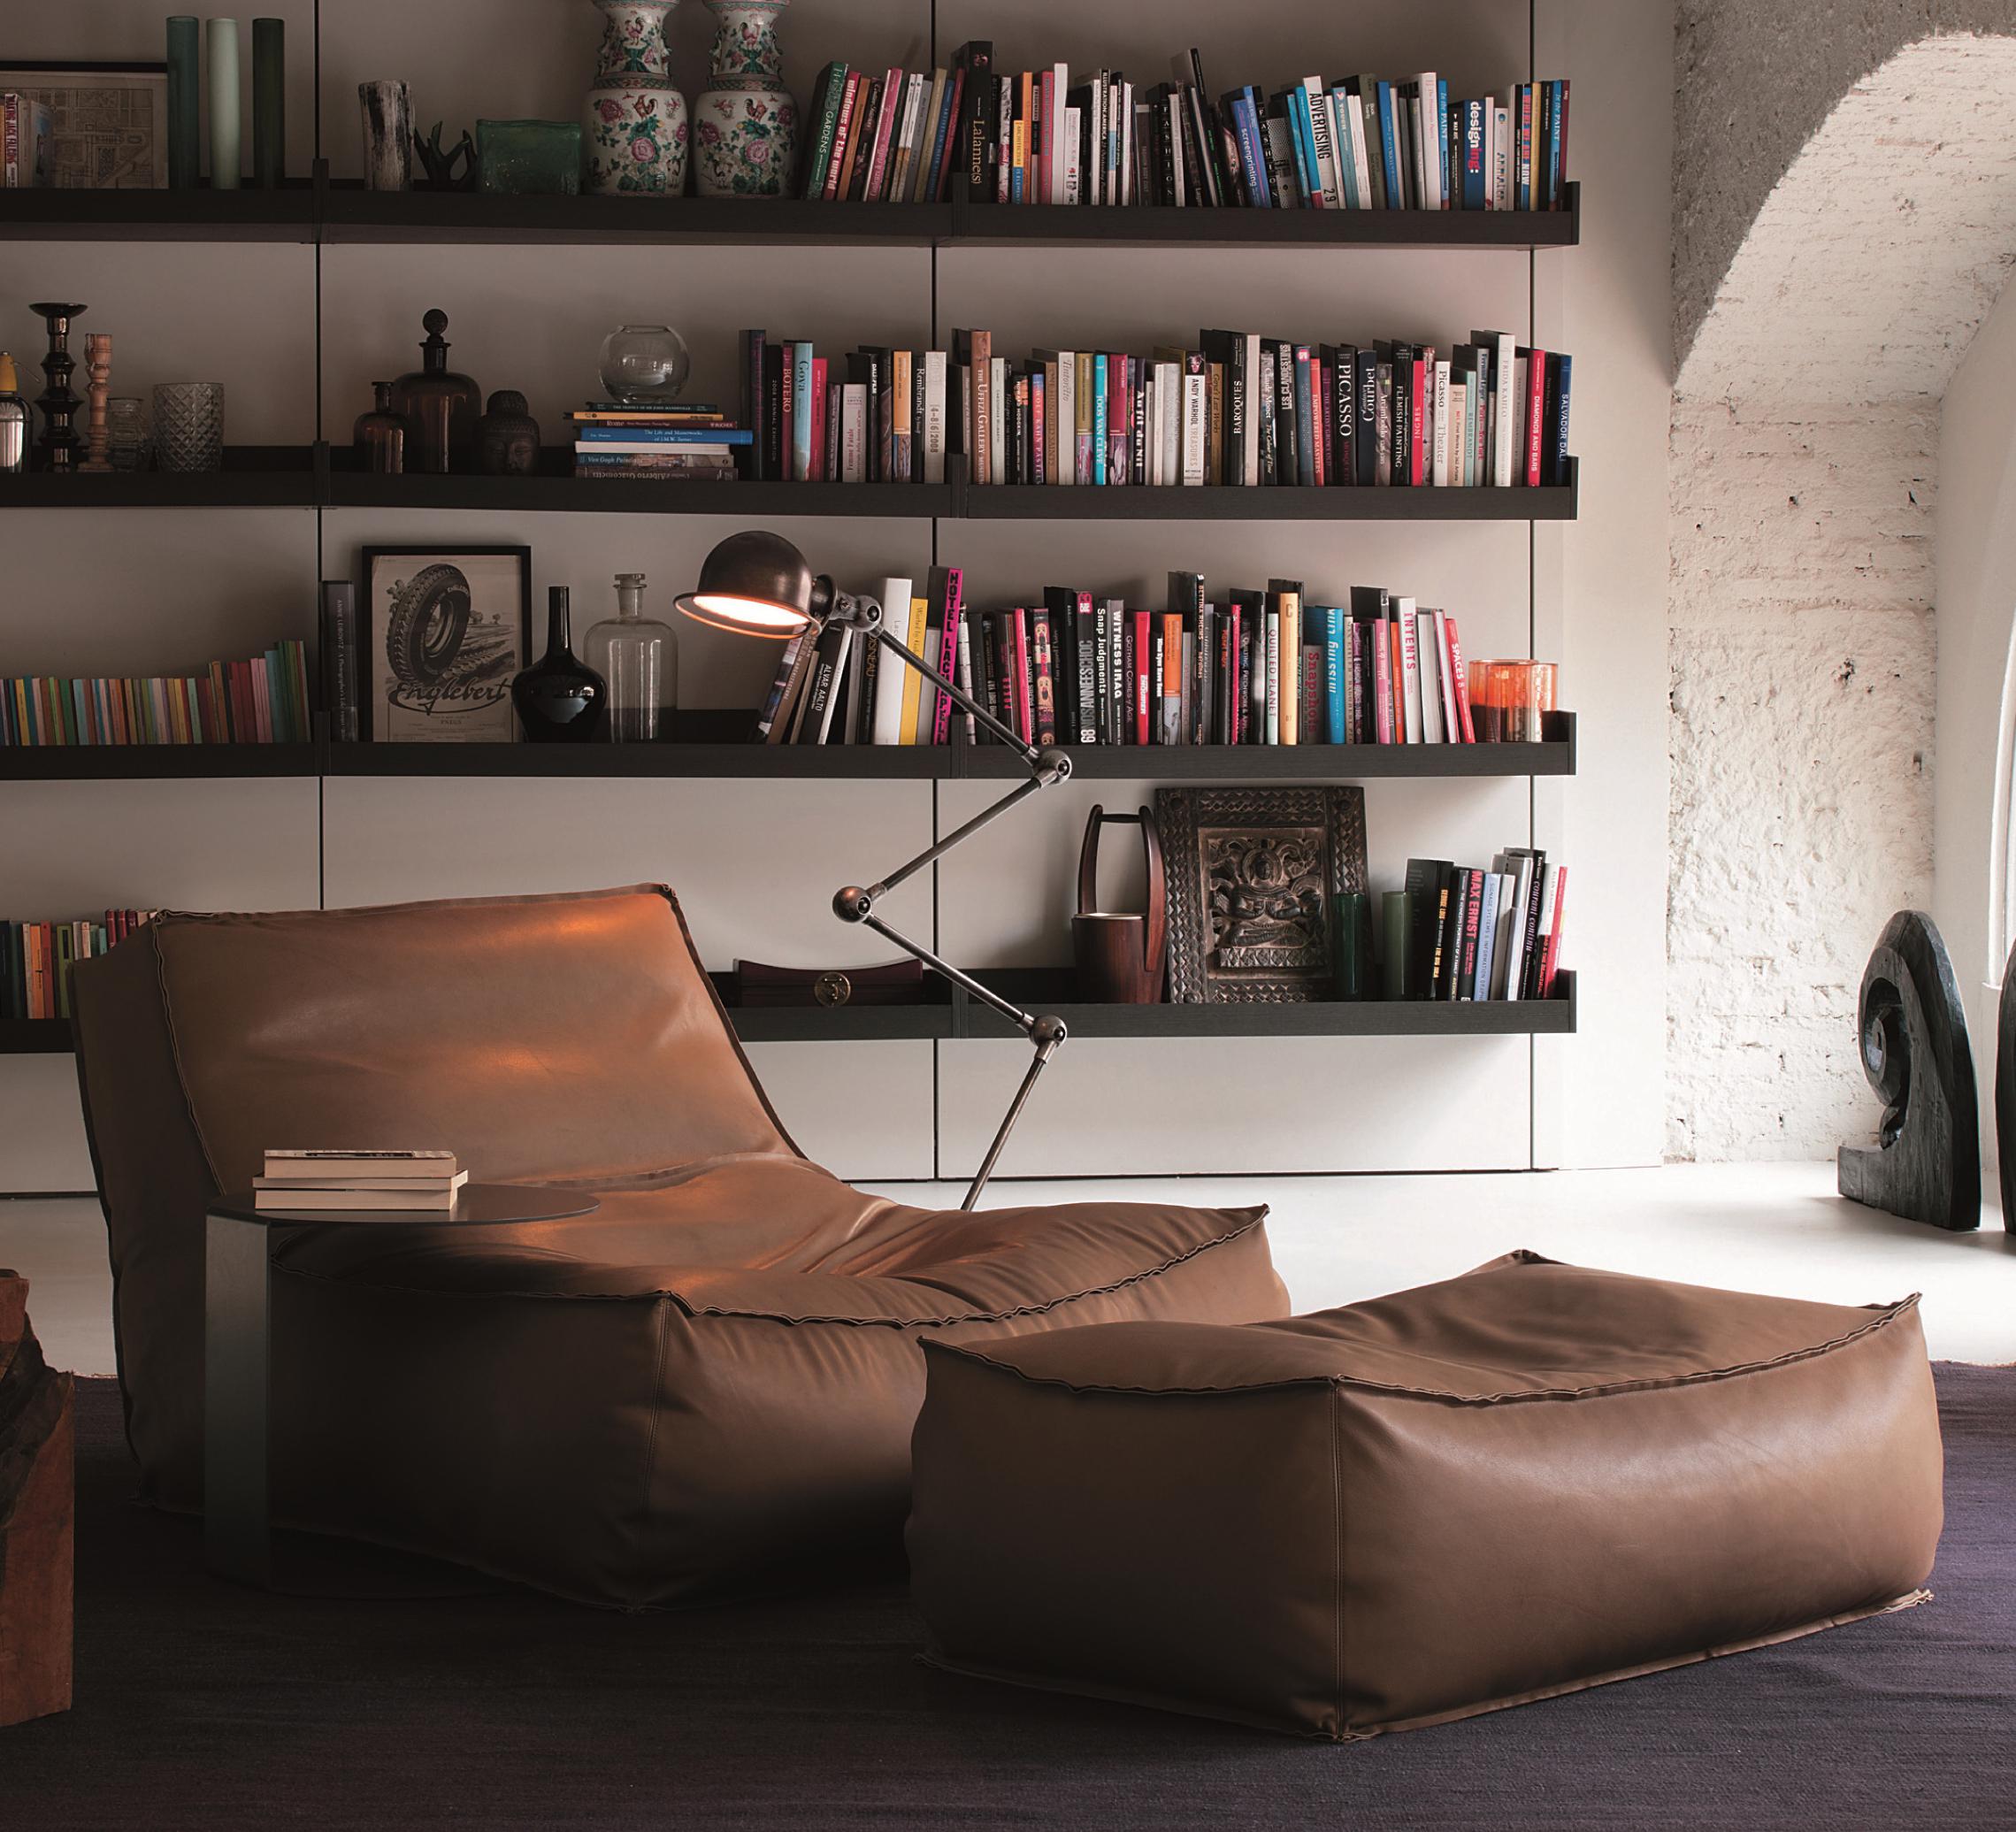 Puf Zoe Chaise Lounge 108 * Verzelloni